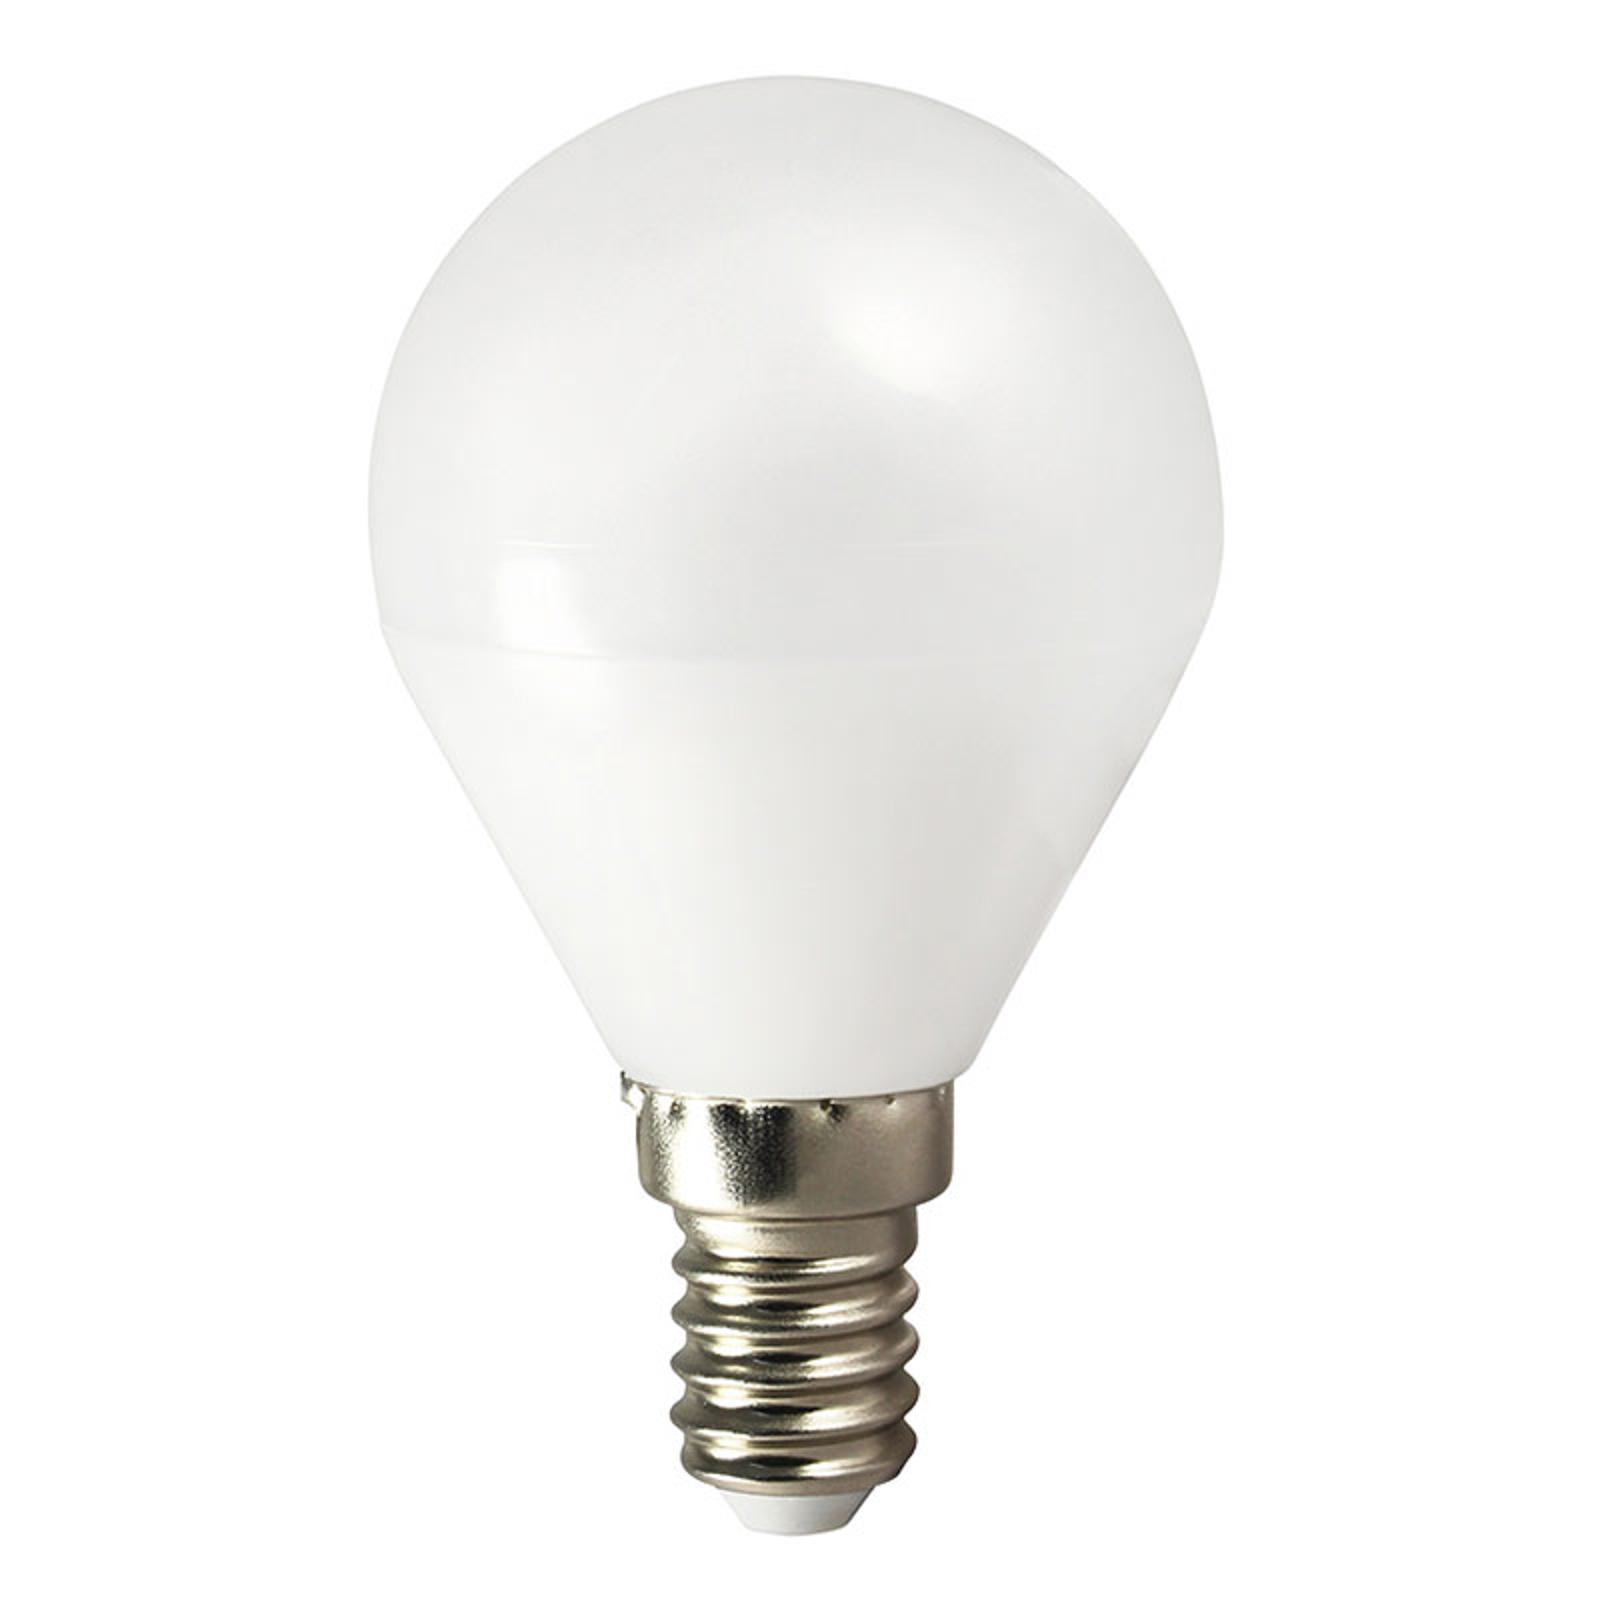 Żarówka LED TEMA E14 5W kropla ciepła biel AC/DC